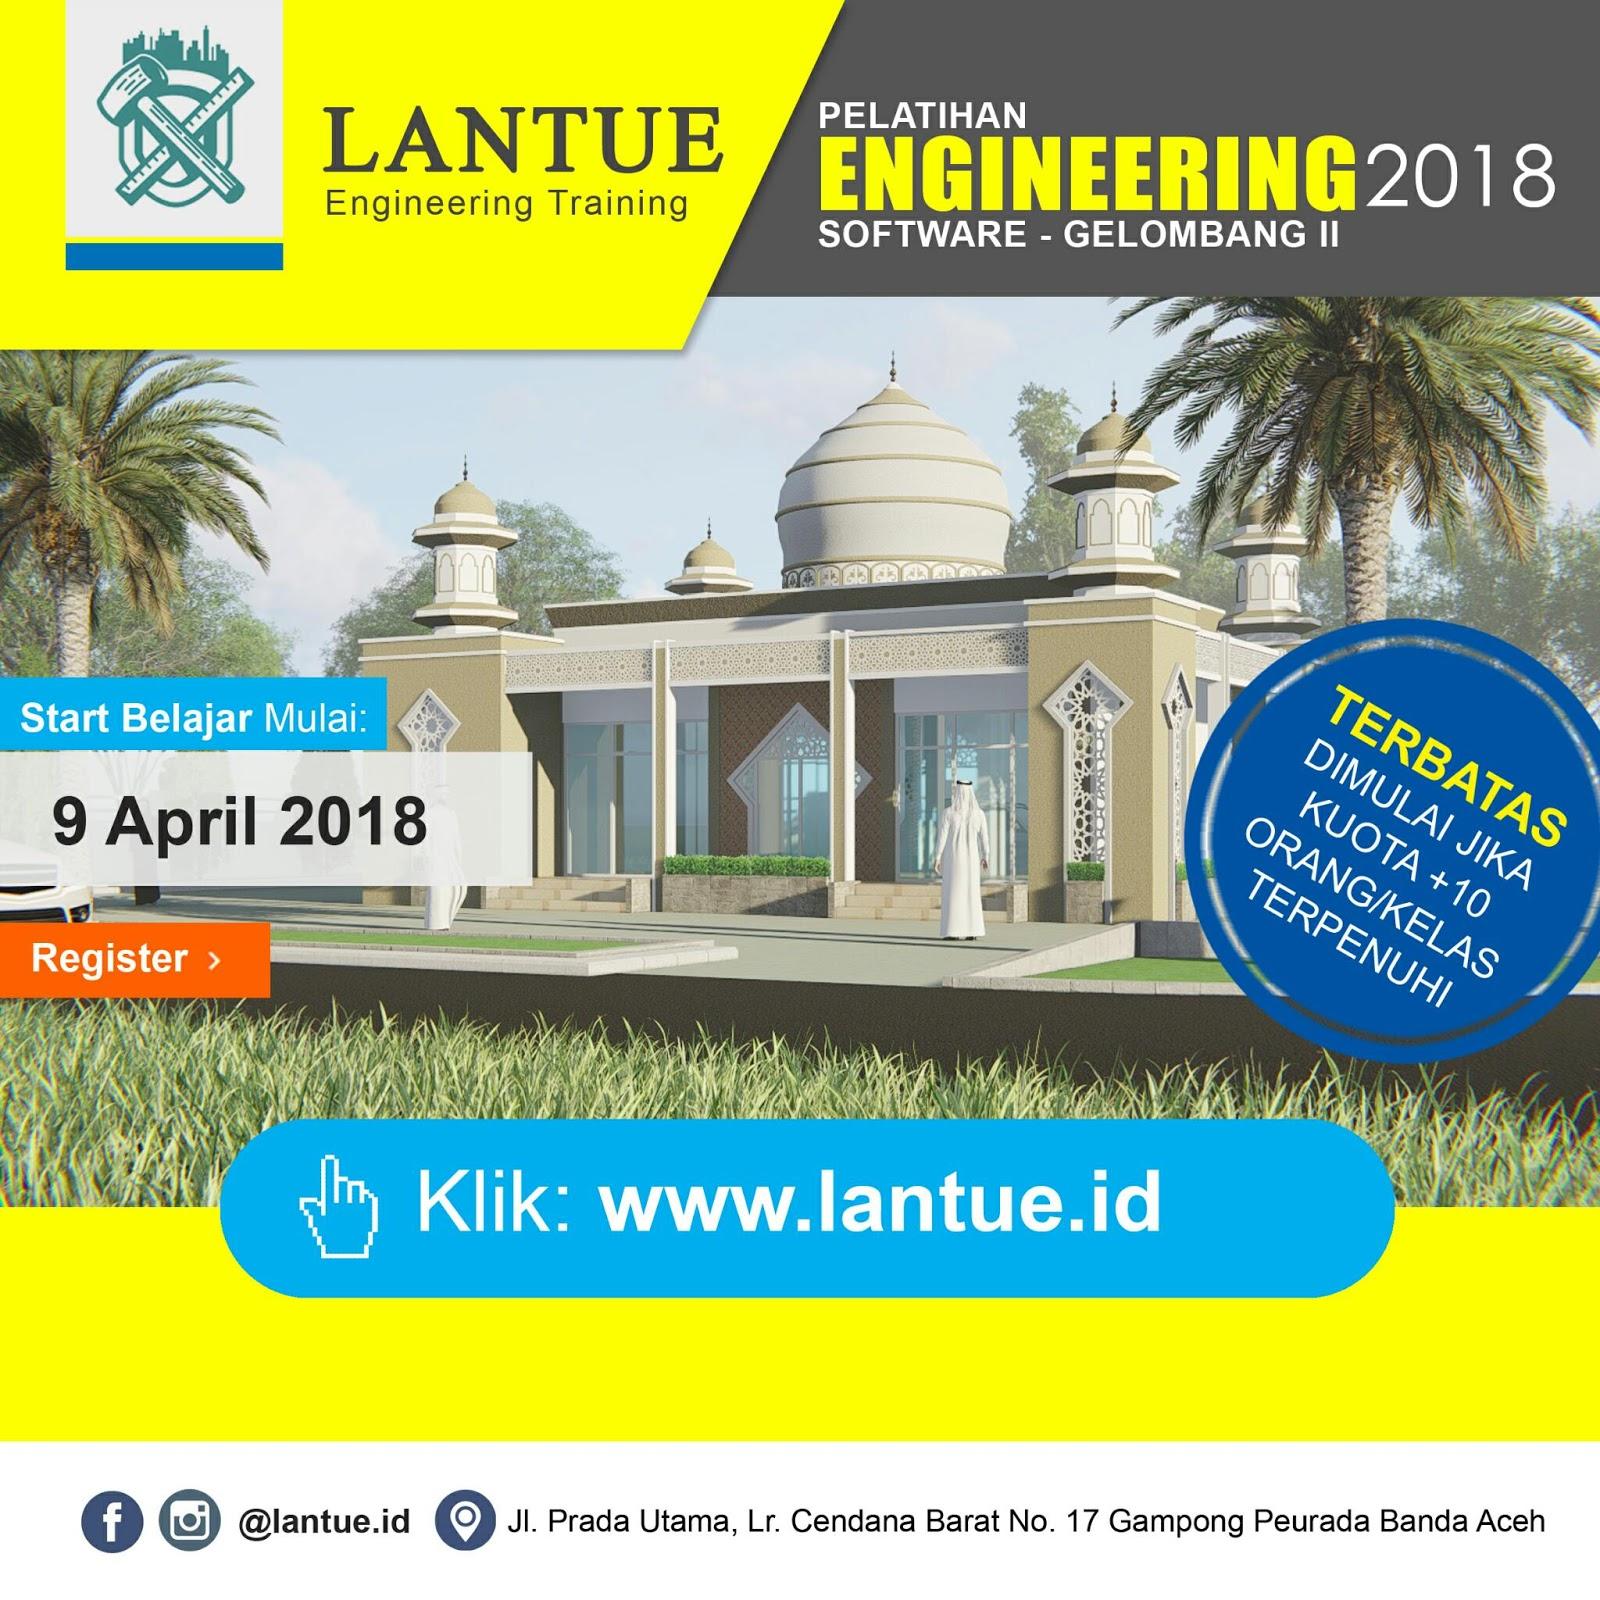 lantue.id